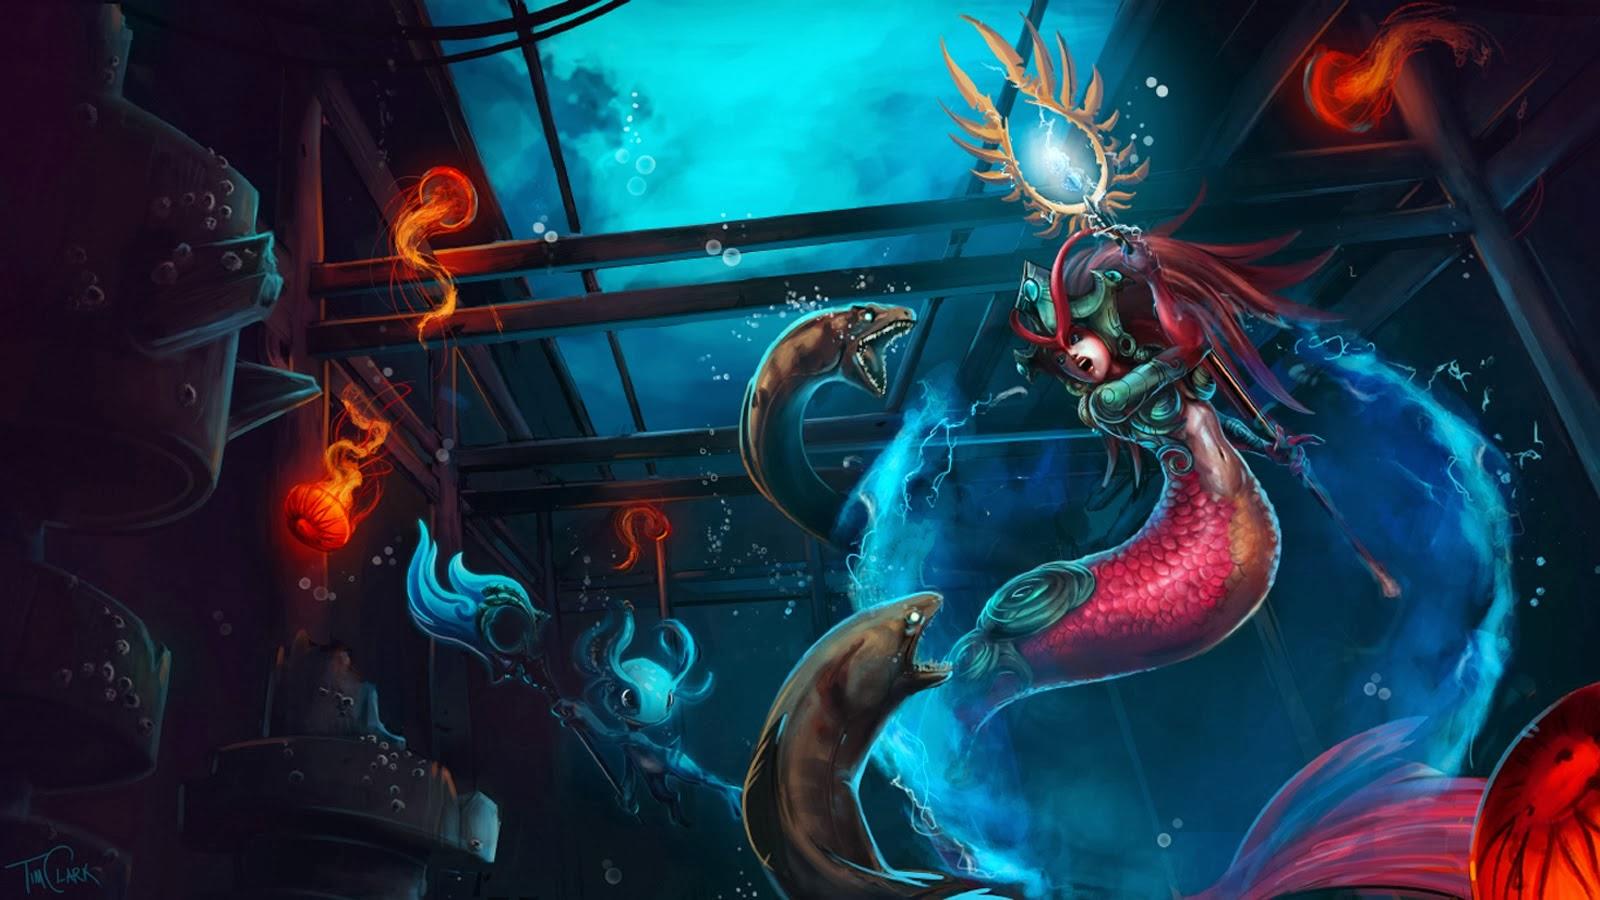 Nami Wallpaper Hd League Of Legends Nami Wallpapers Desktop